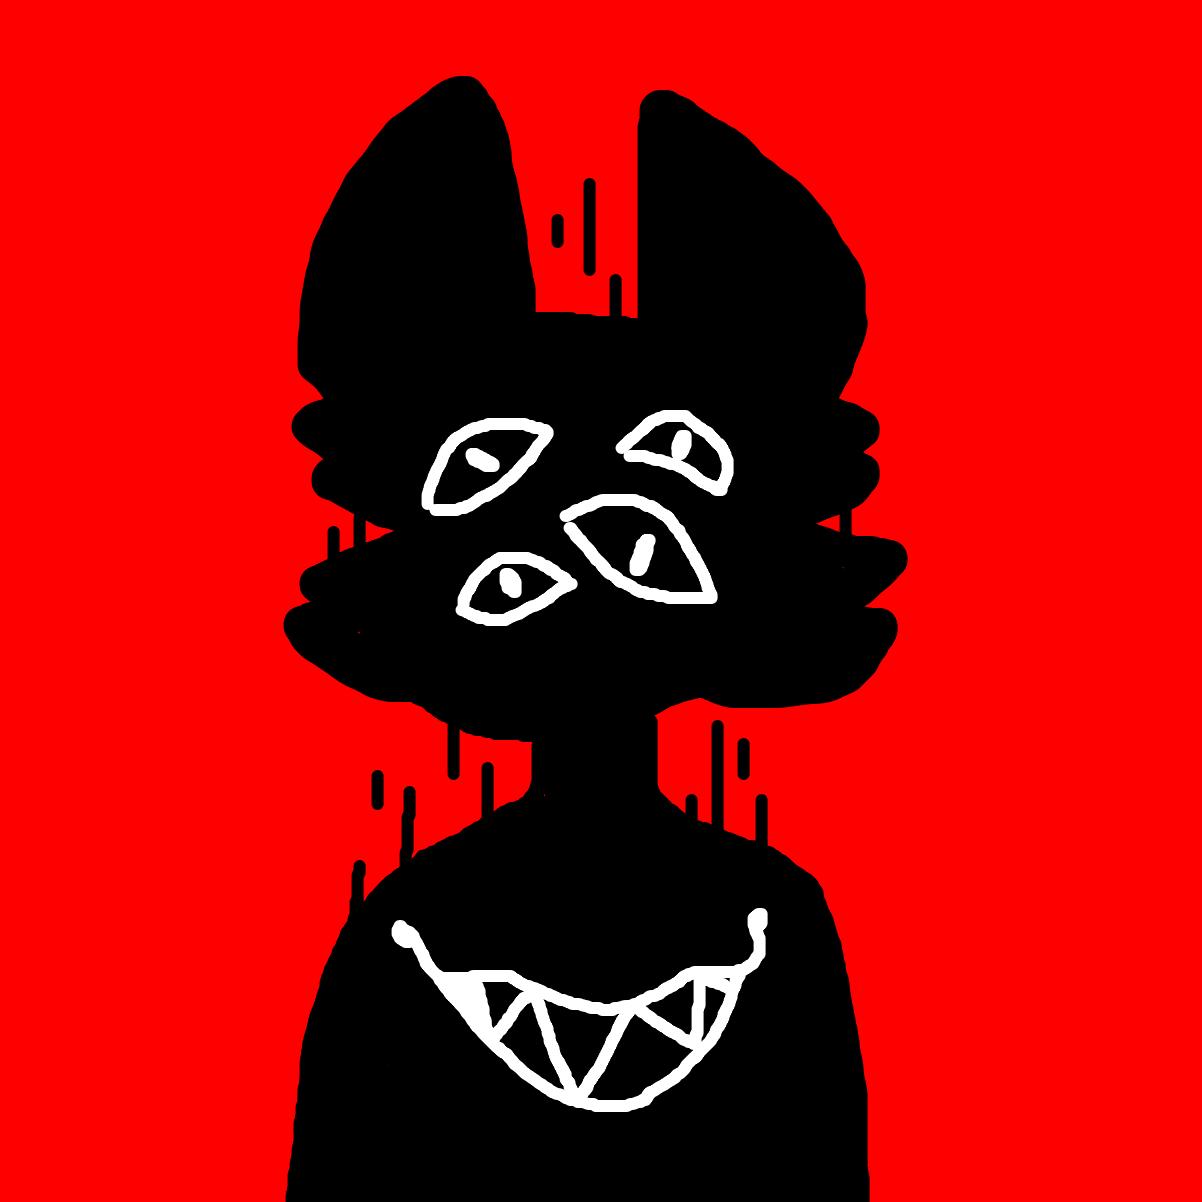 Profile picture for the comic artist, terrifi3d